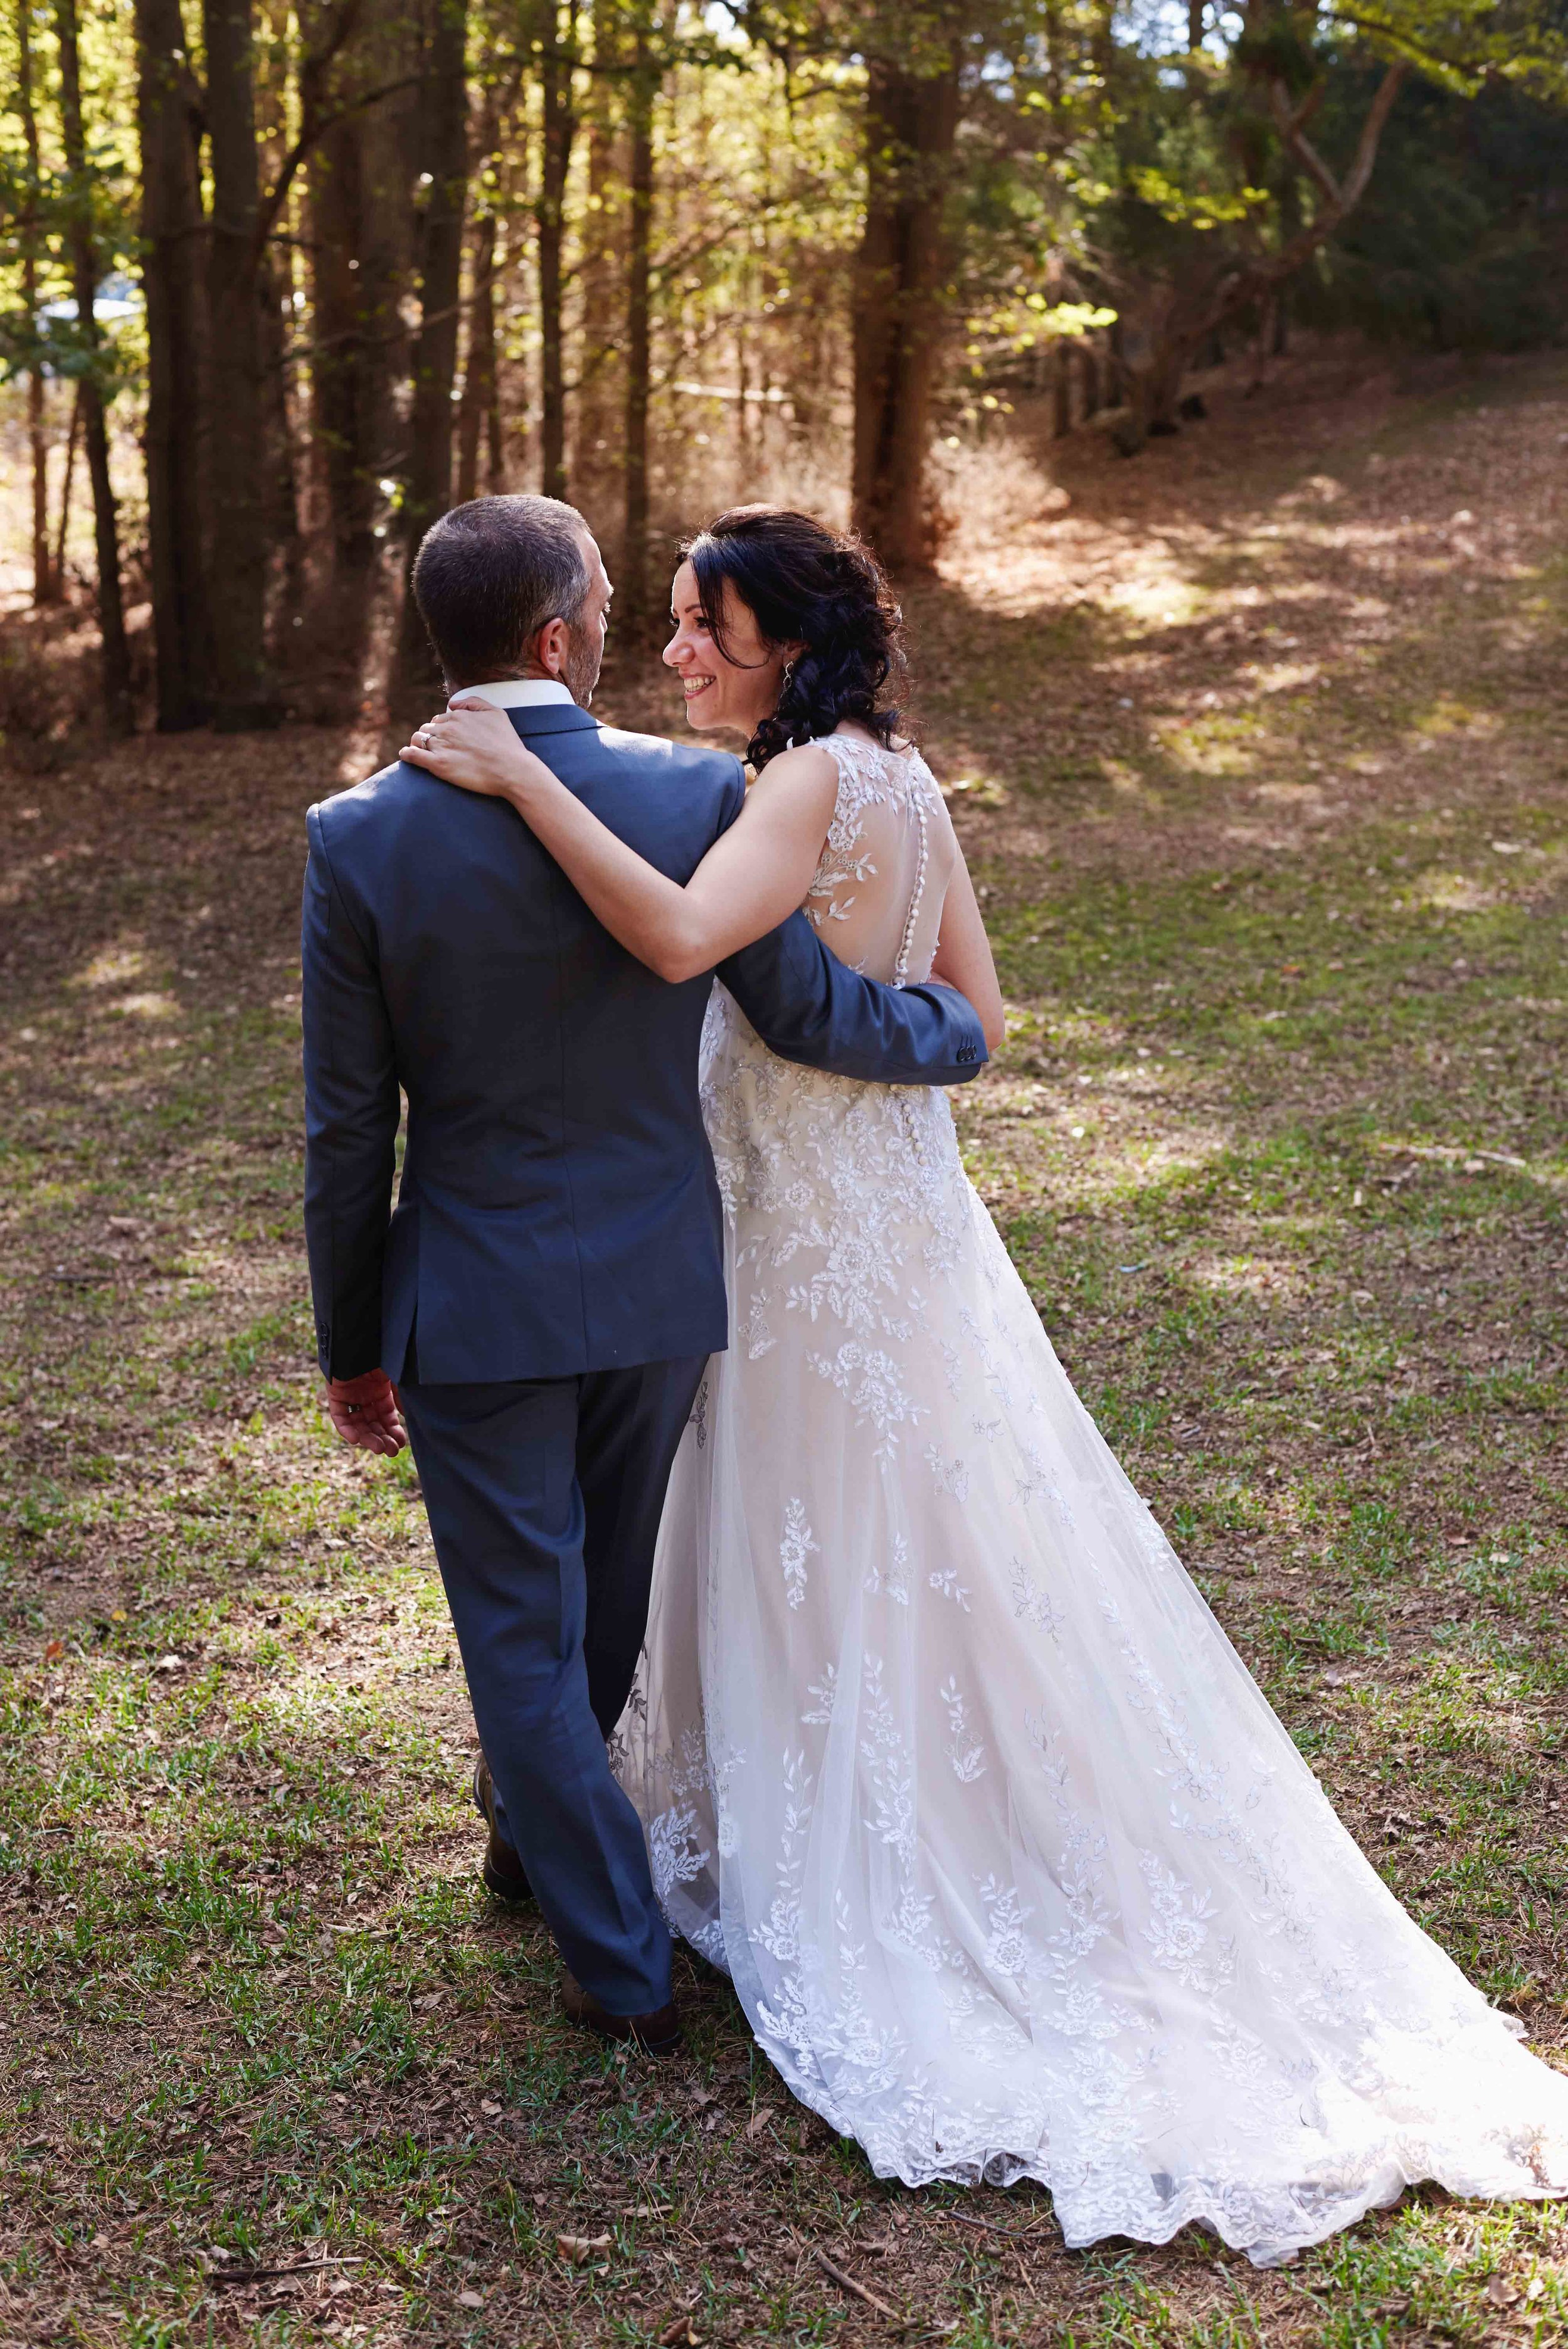 sorrento-wedding-photography-all-smiles-marissa-jade-photography-136.jpg